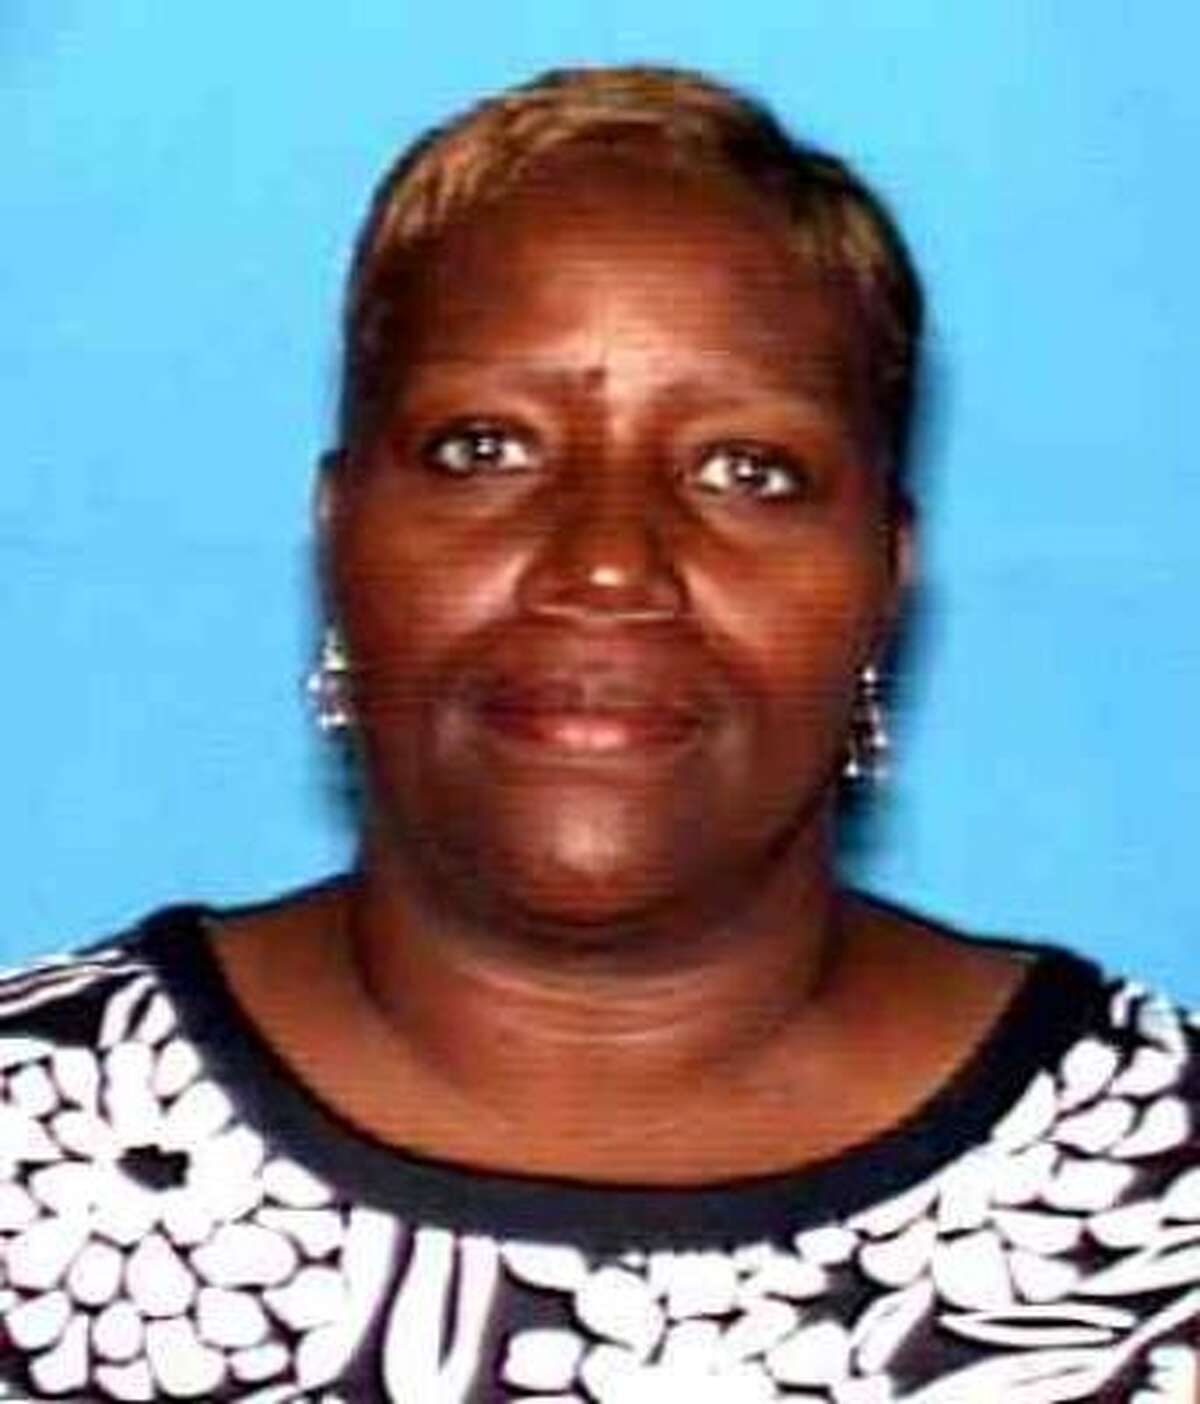 Debra Washington, mother of suspect Maron Thomas